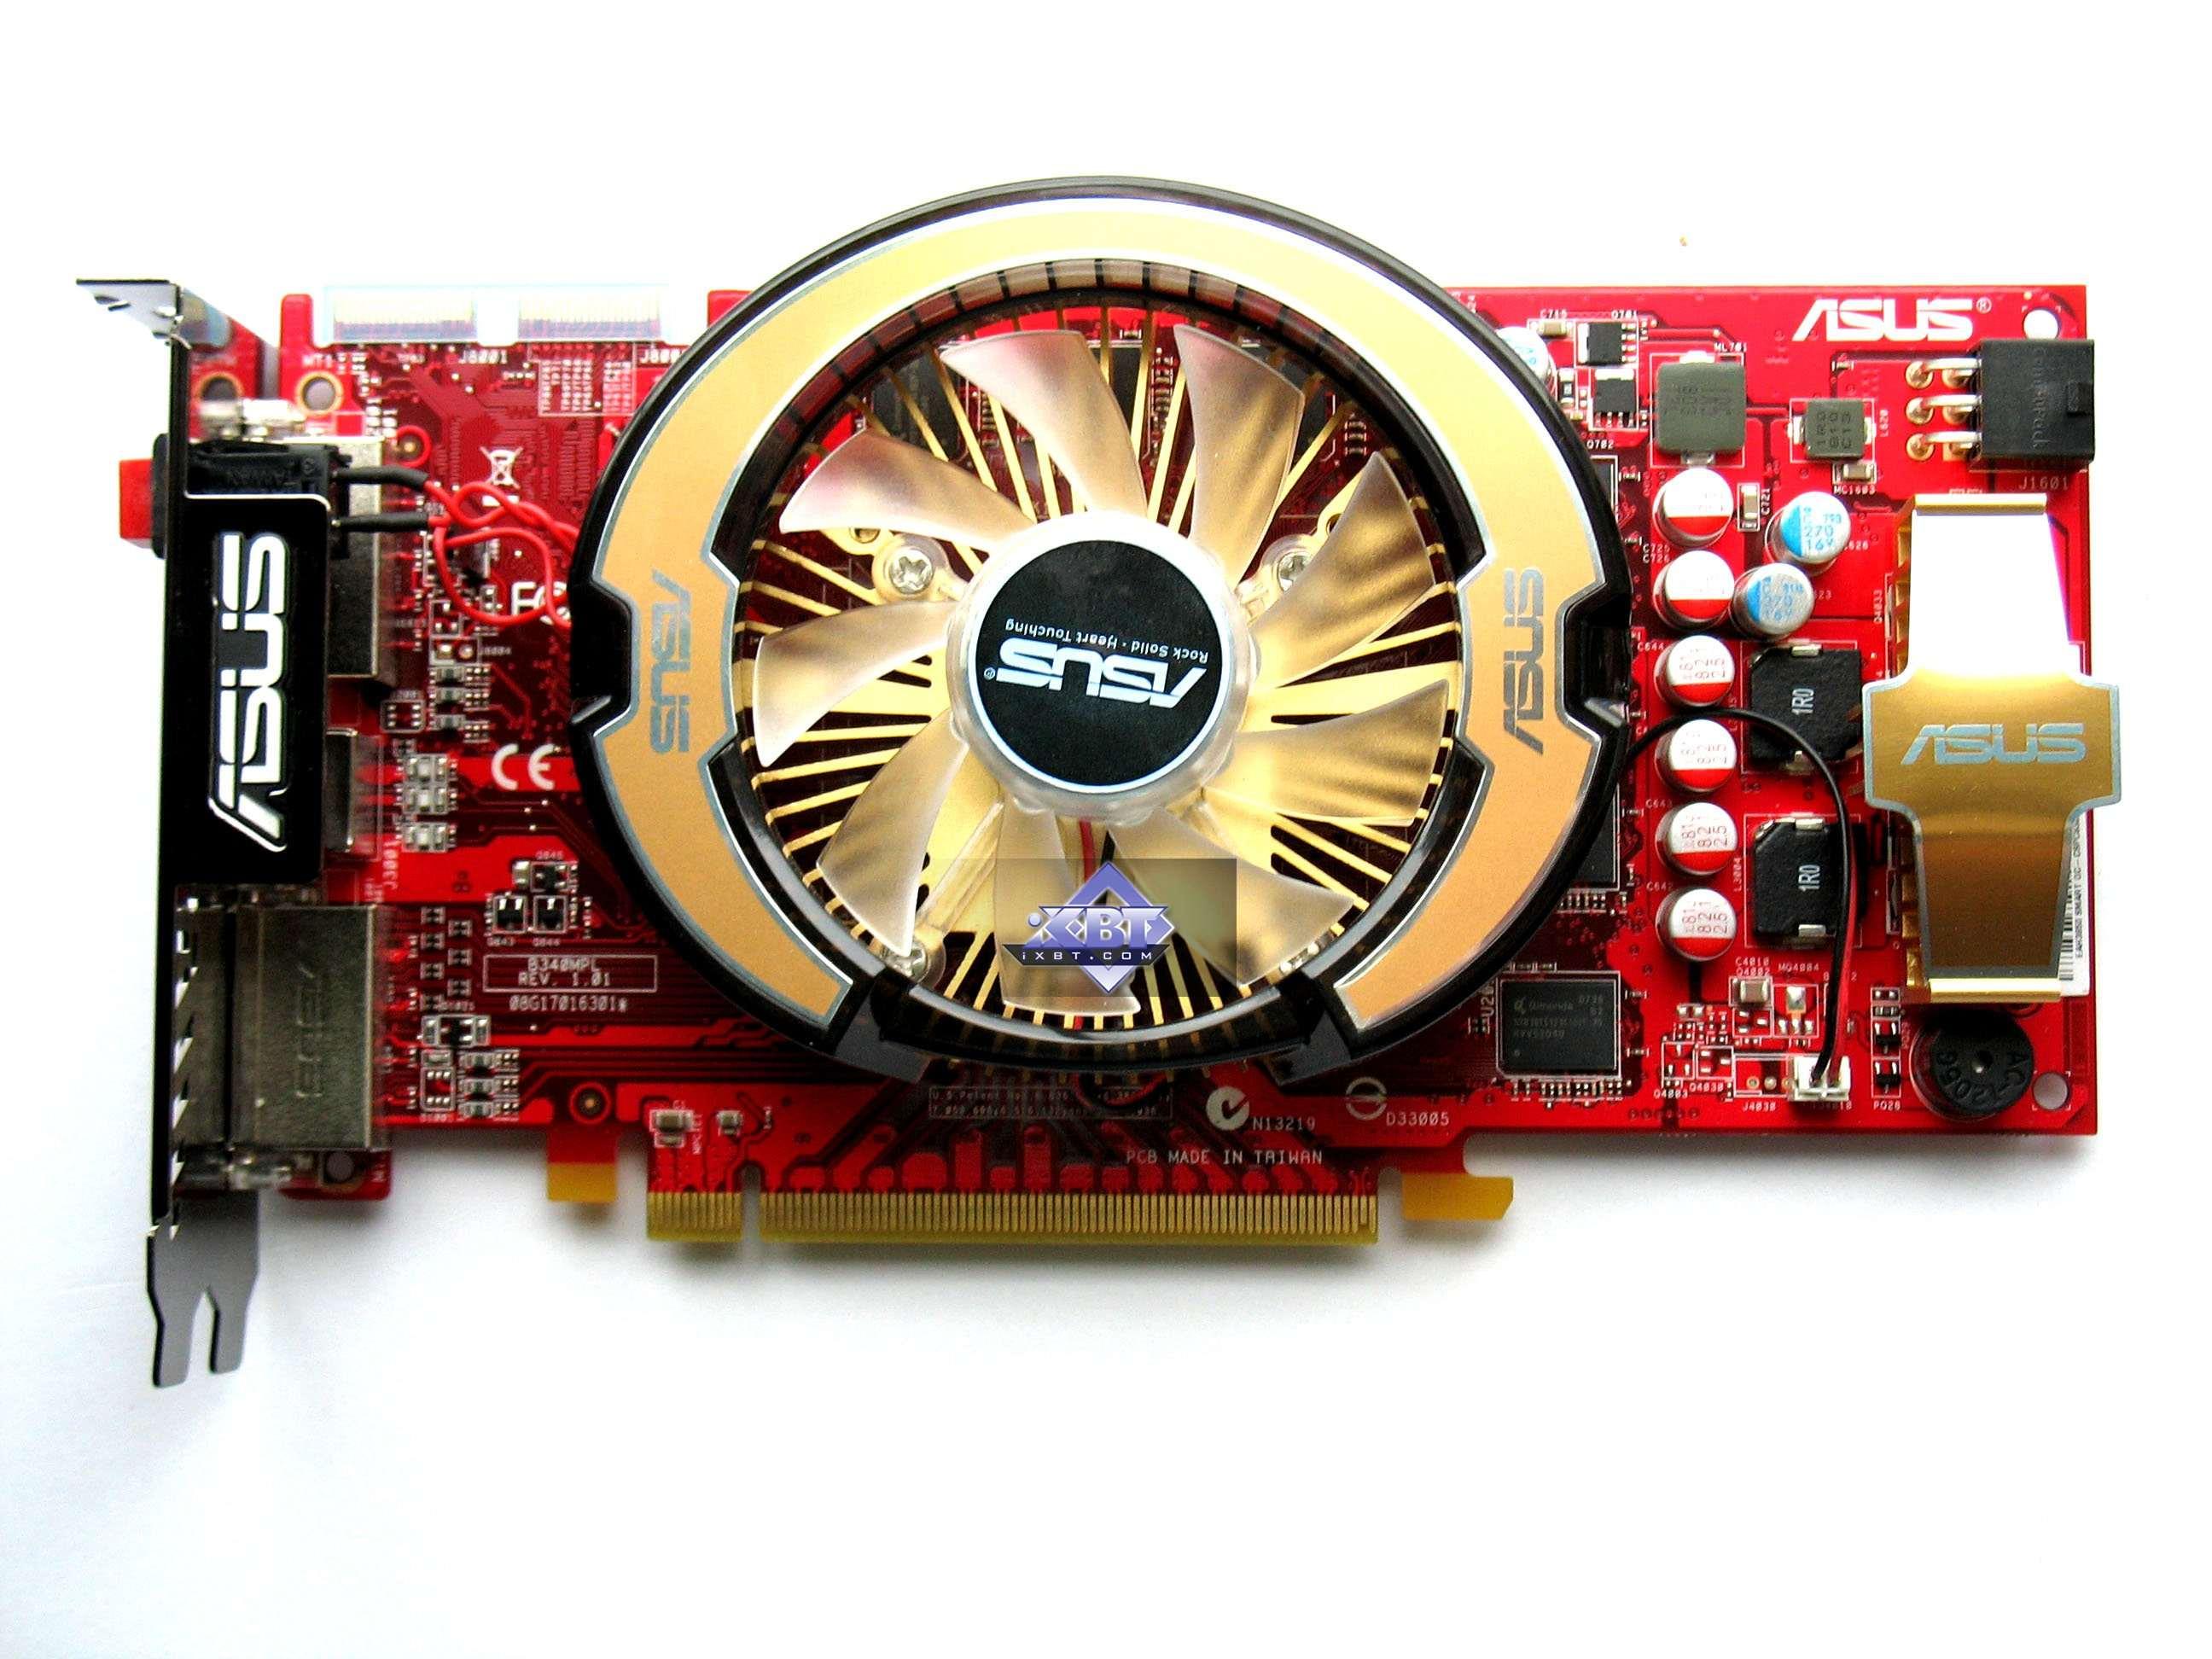 Radeon hd 3850 драйвер